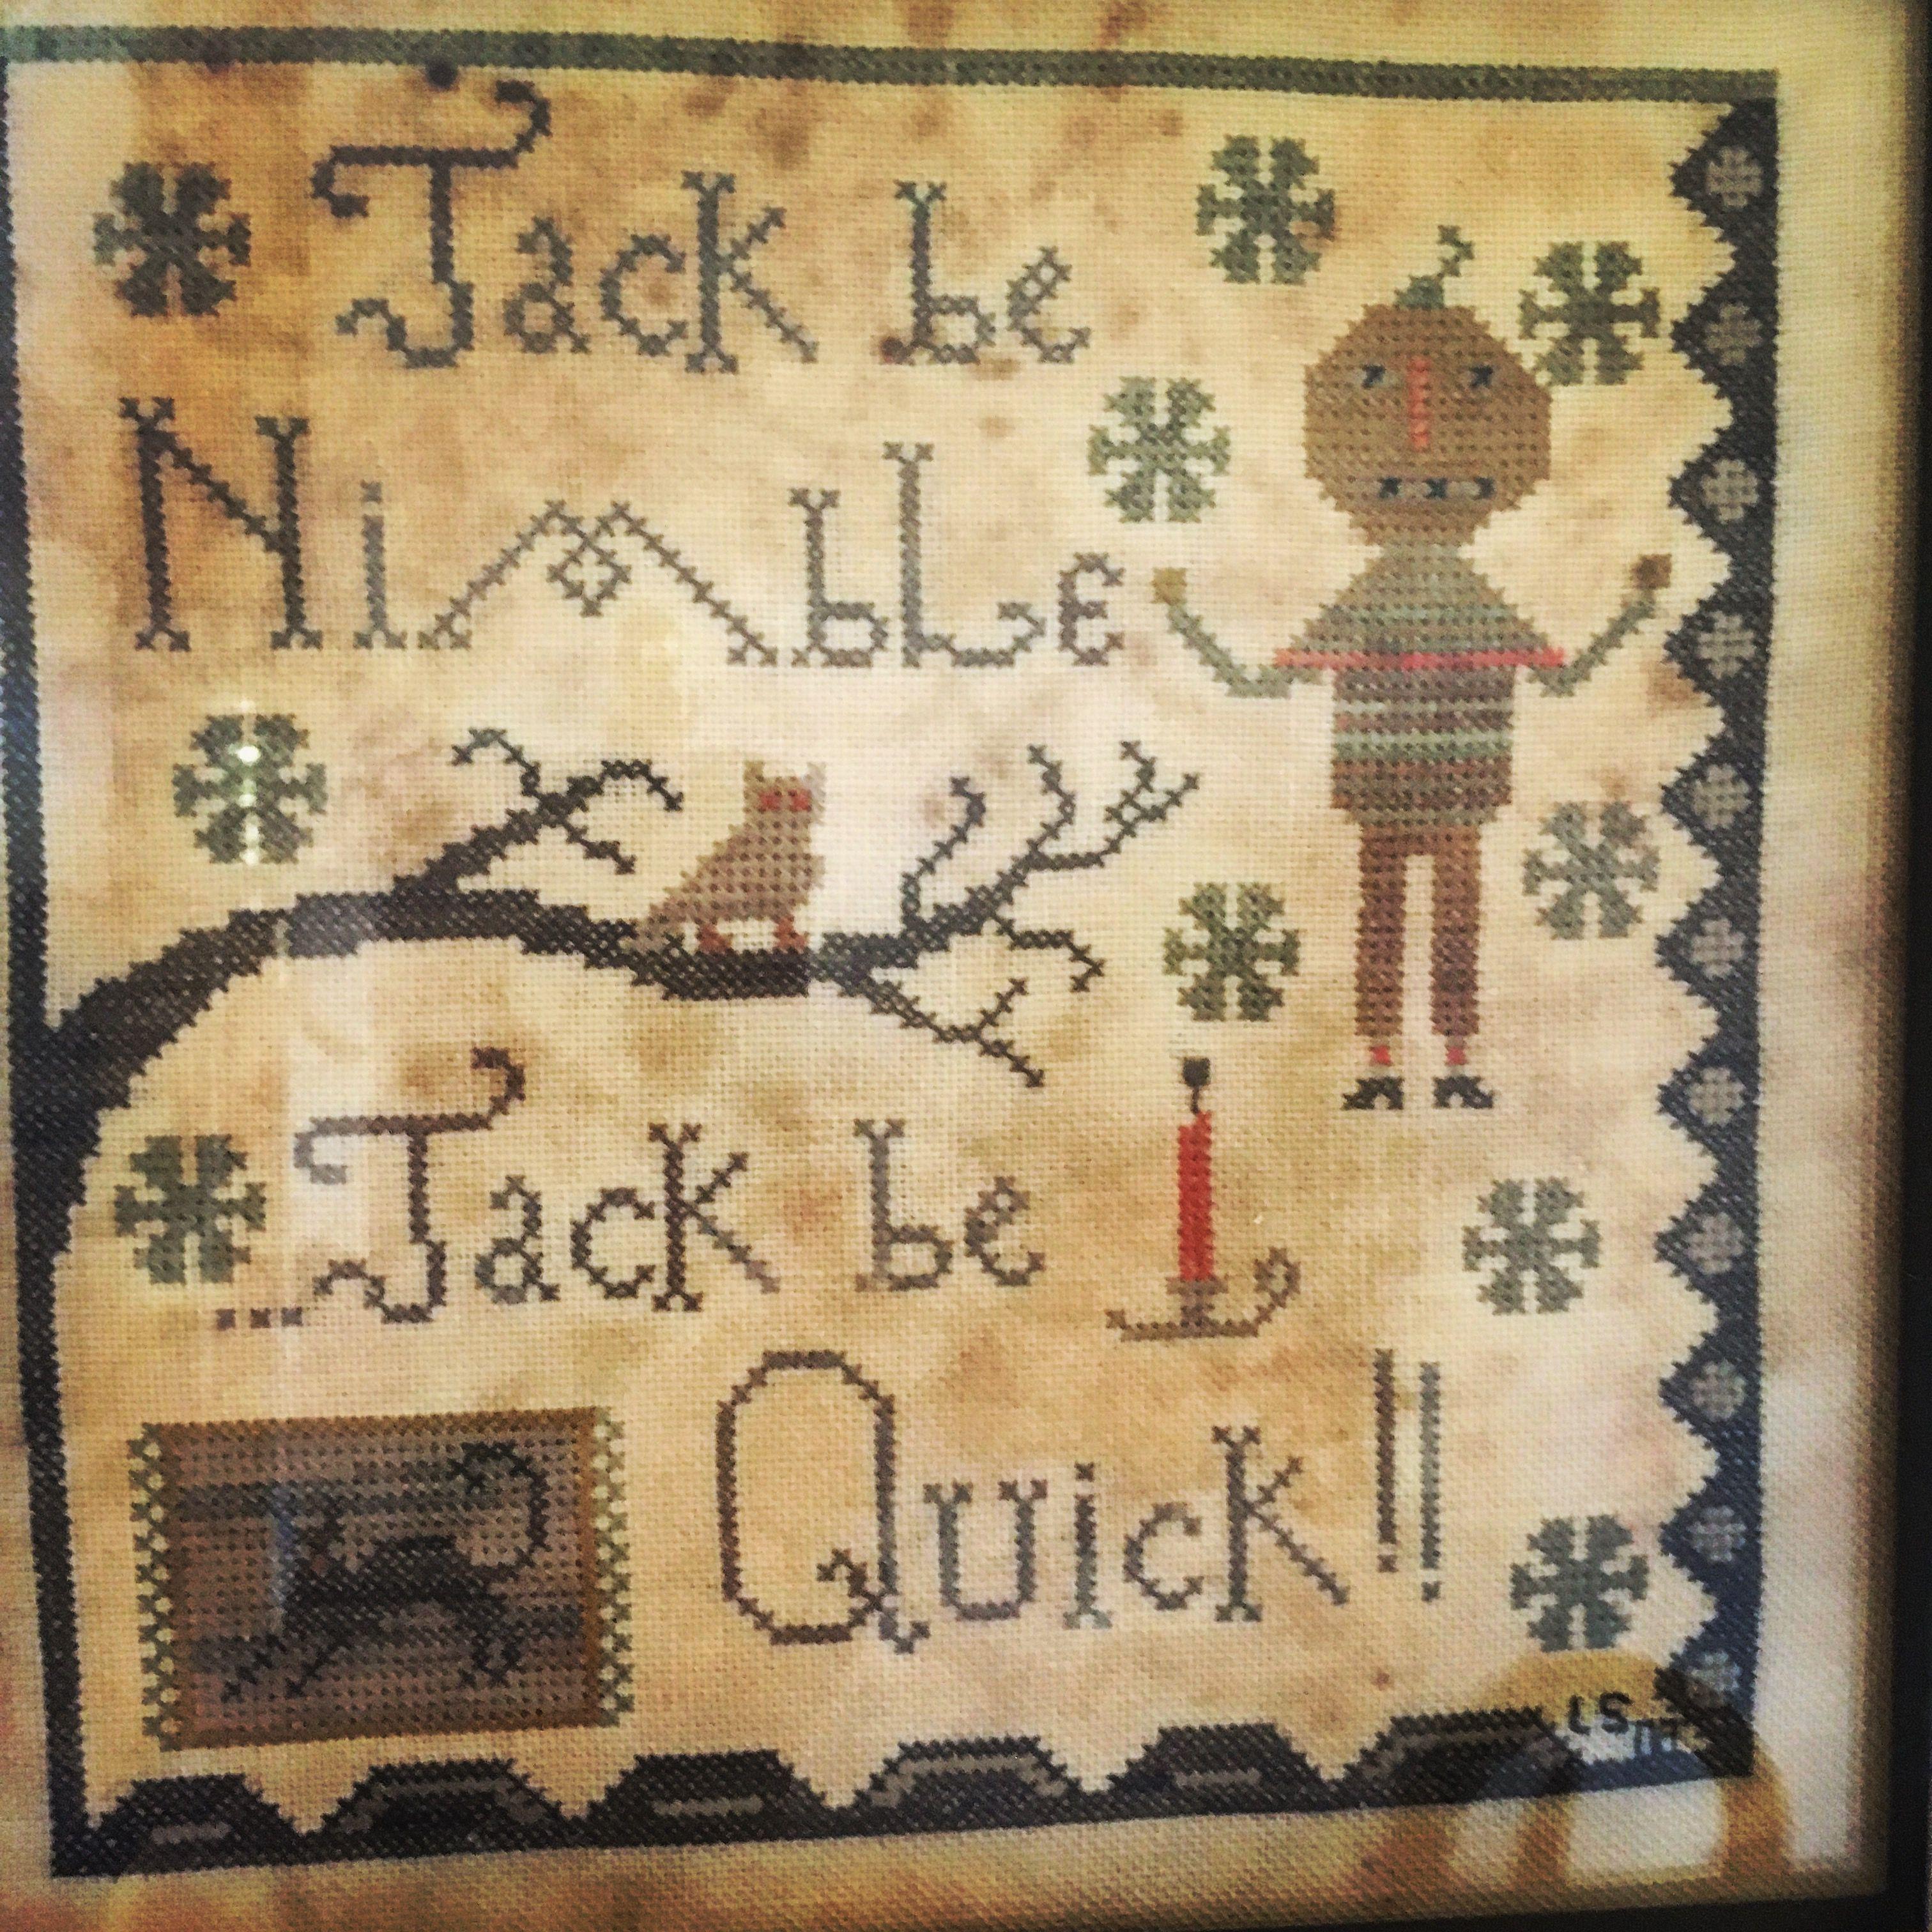 Jack B Nimble